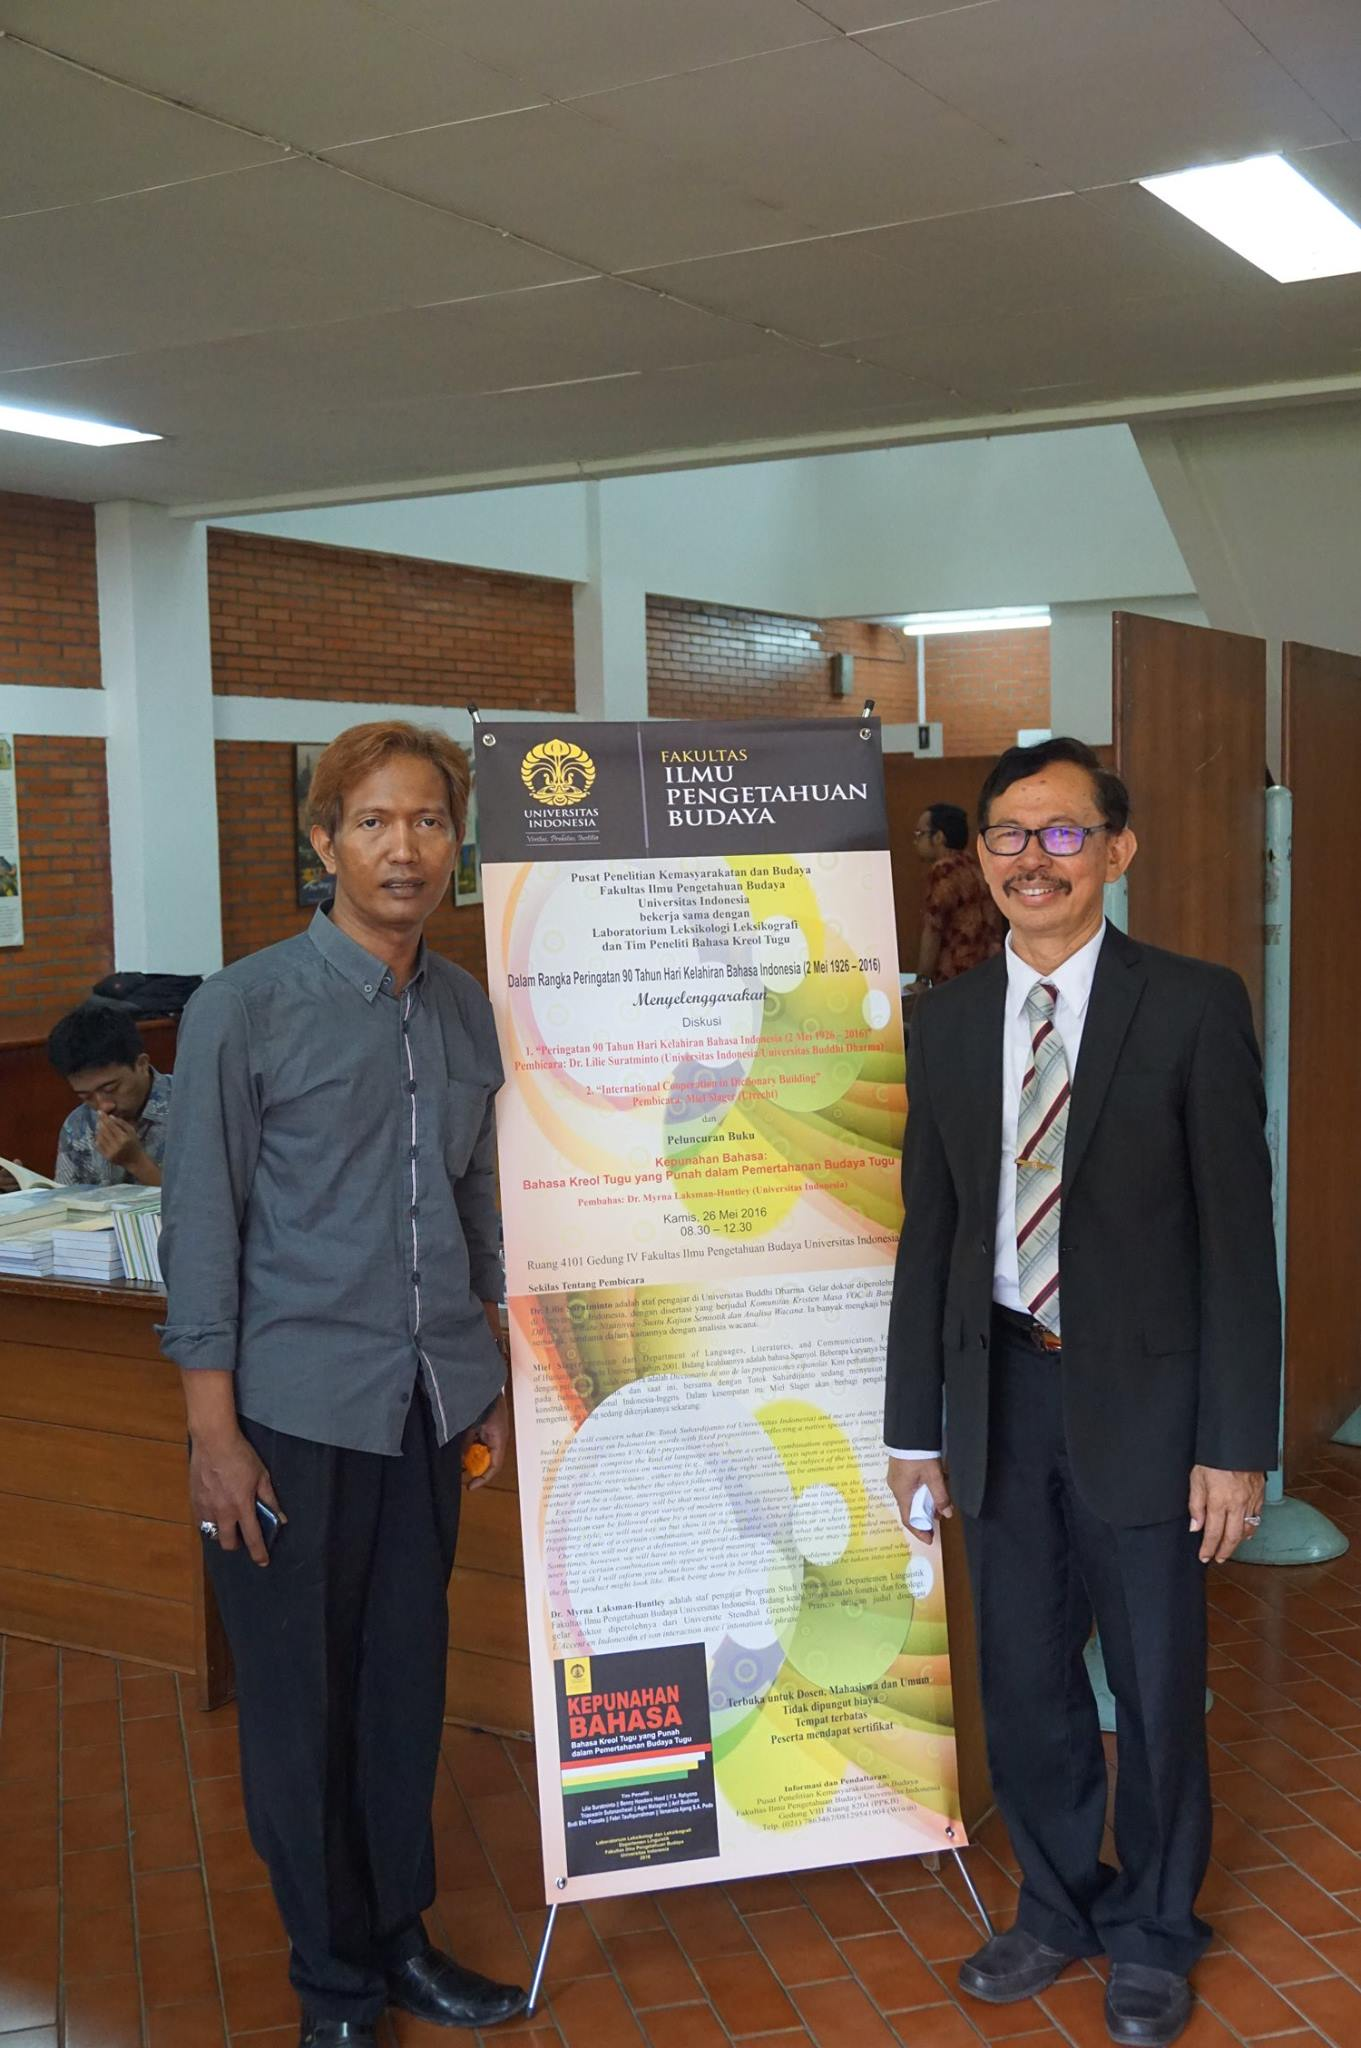 Bersama perwakilan warga Kampung Tugu, Guido Quiko